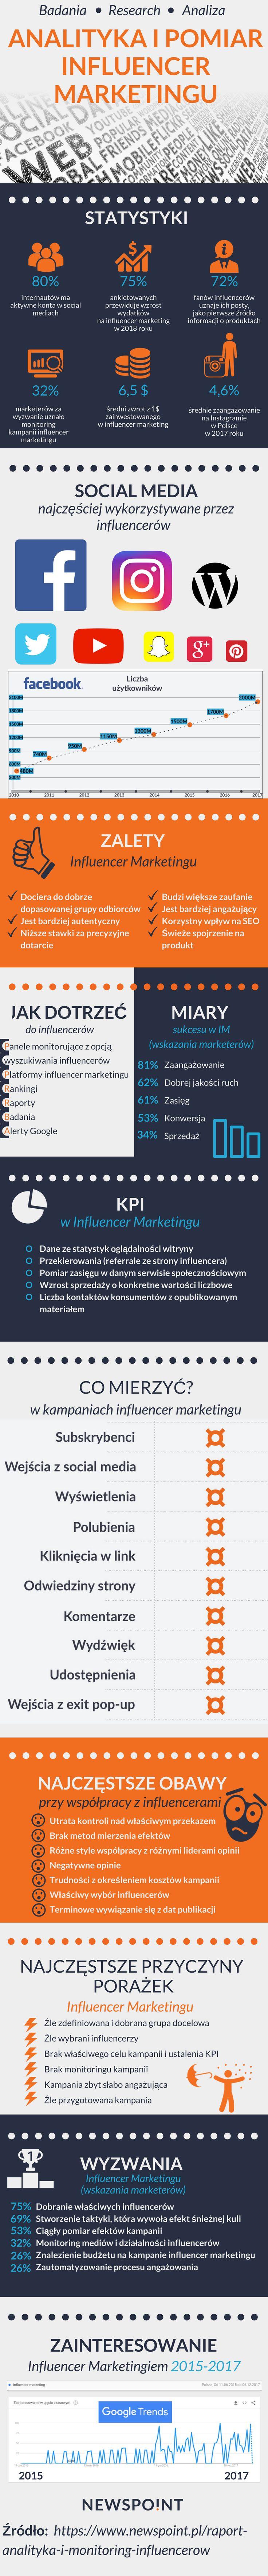 Raport do pobrania na: https://www.newspoint.pl/raport-analityka-i-monitoring-influencerow/?utm_source=InstagramInfografika&utm_medium=socialmedia&utm_campaign=RaportInfluencerMarketing